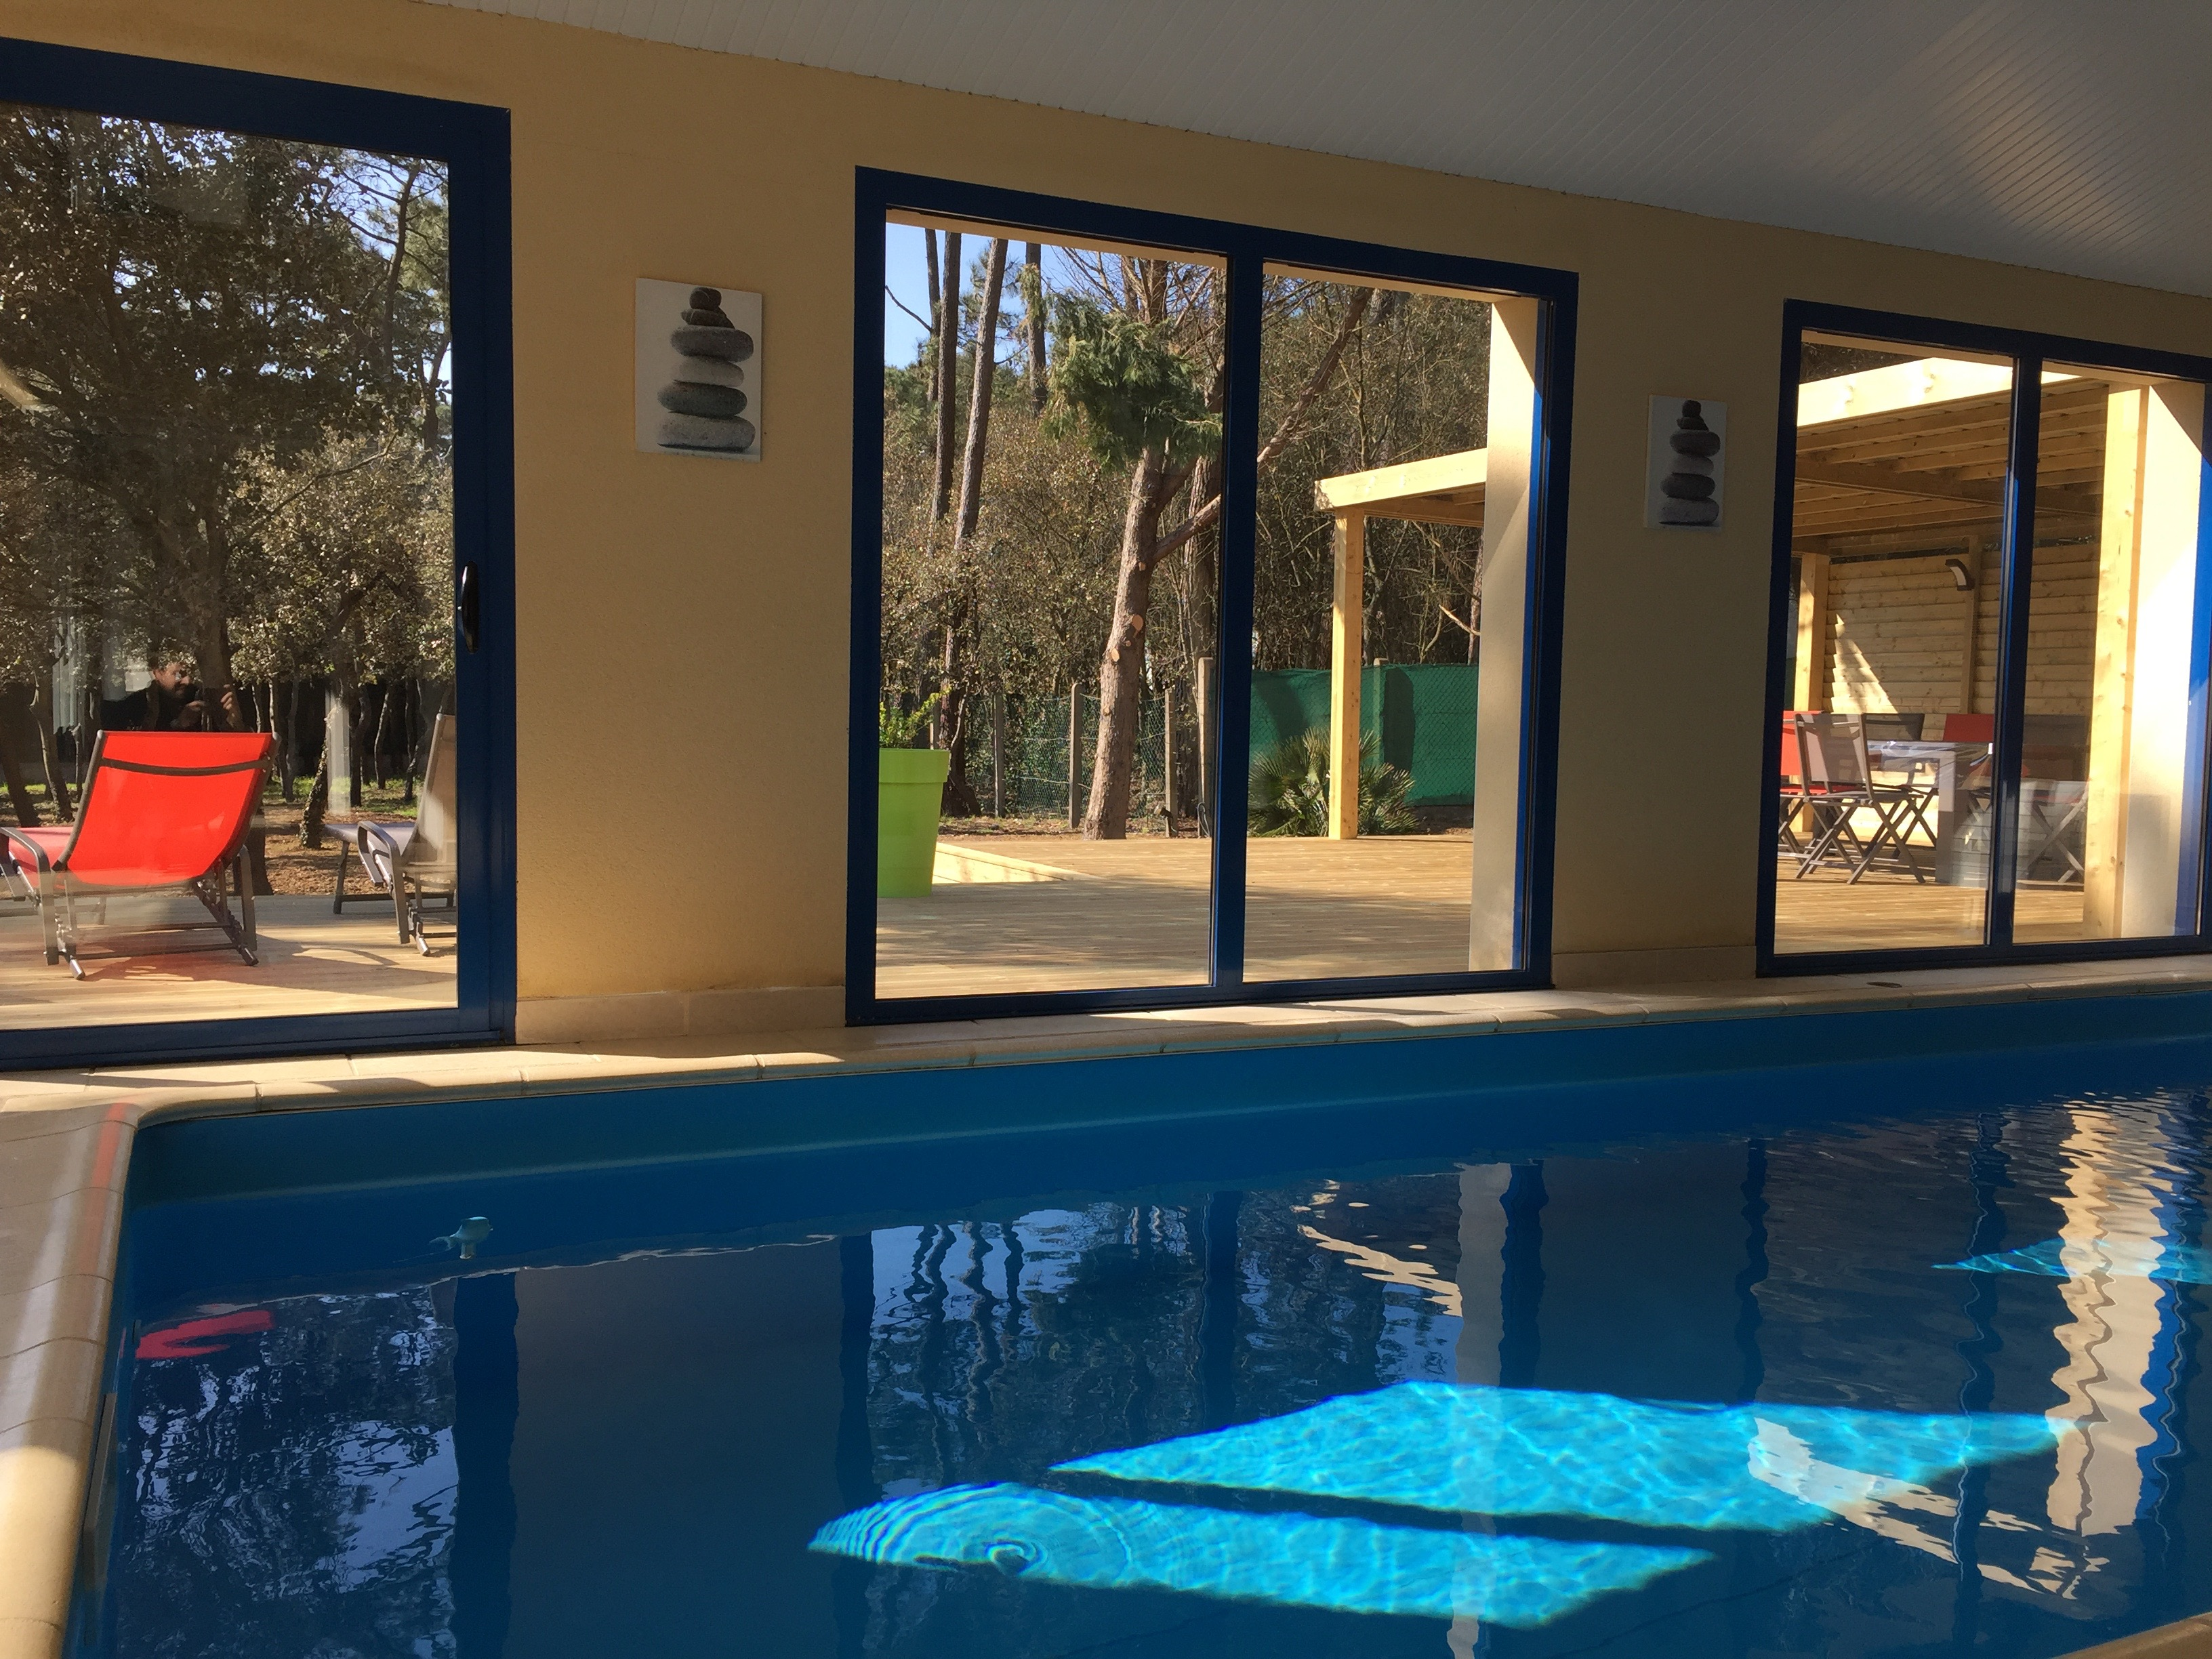 Location villa avec piscine int rieure en vend e - Villa bretagne piscine interieure ...